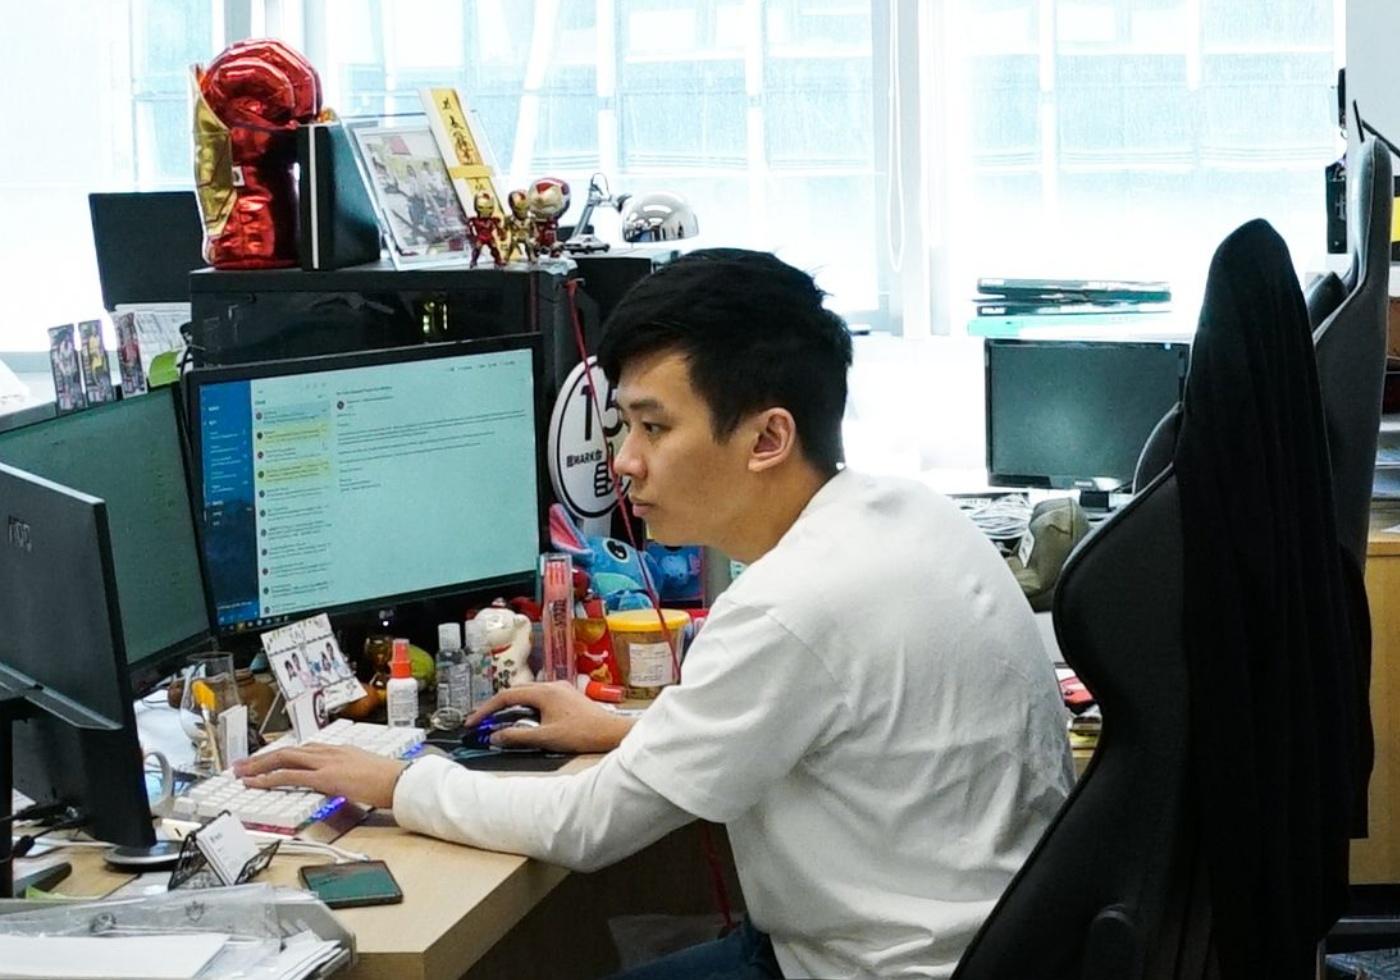 Patrick Tu